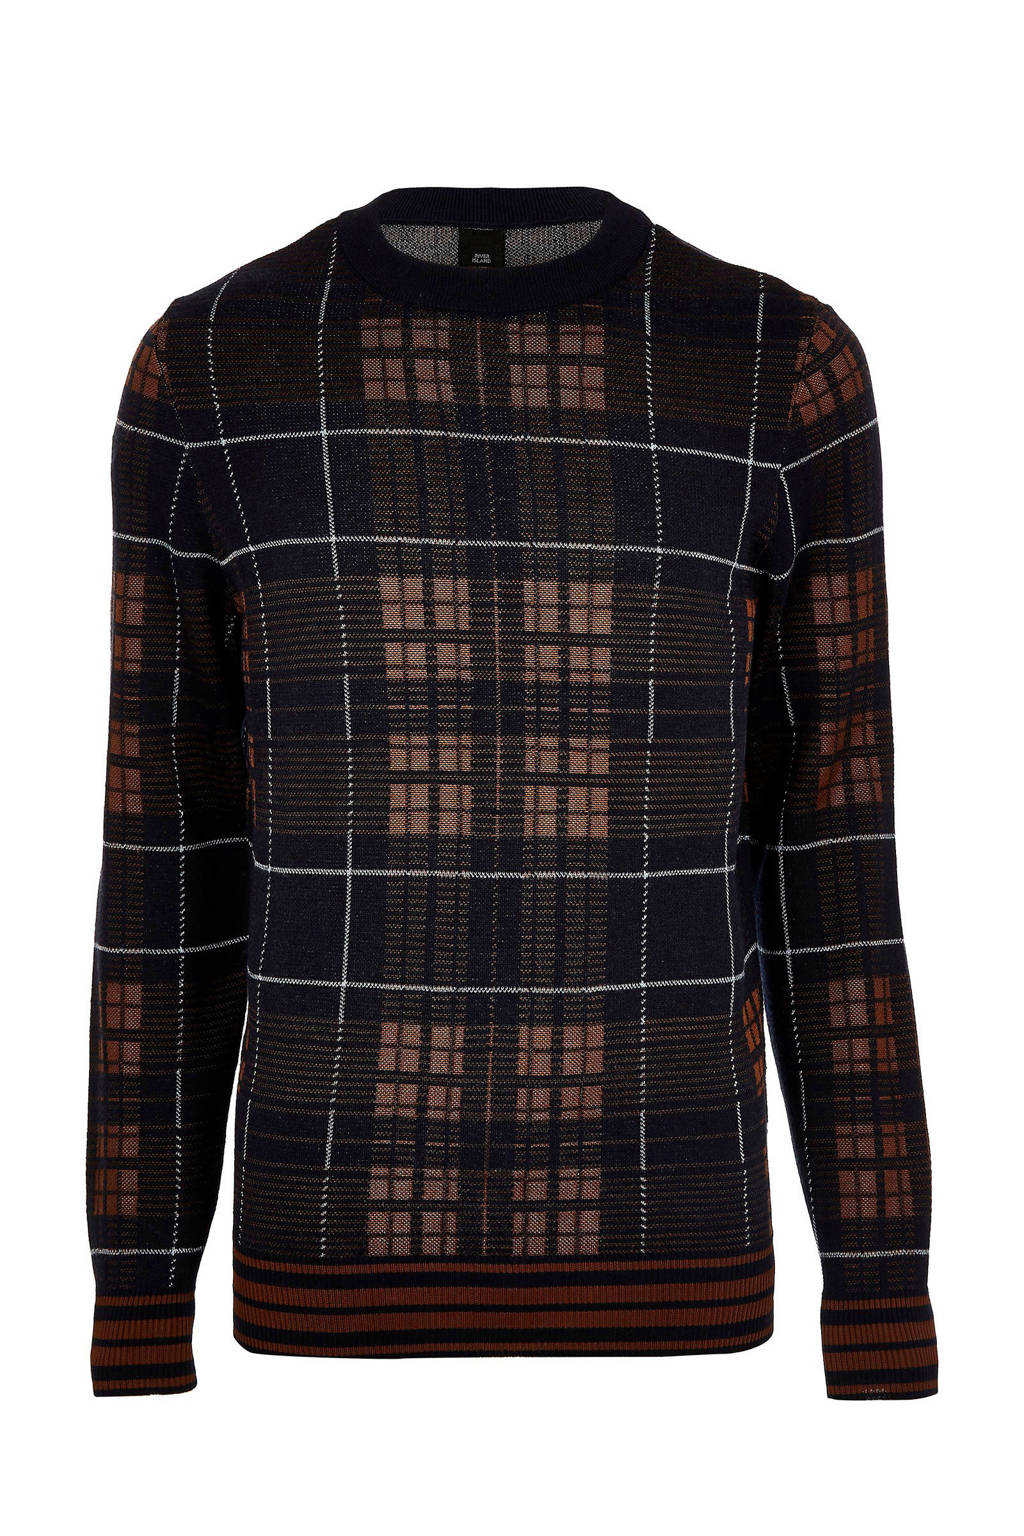 River Island trui met ruitprint, Donkerblauw